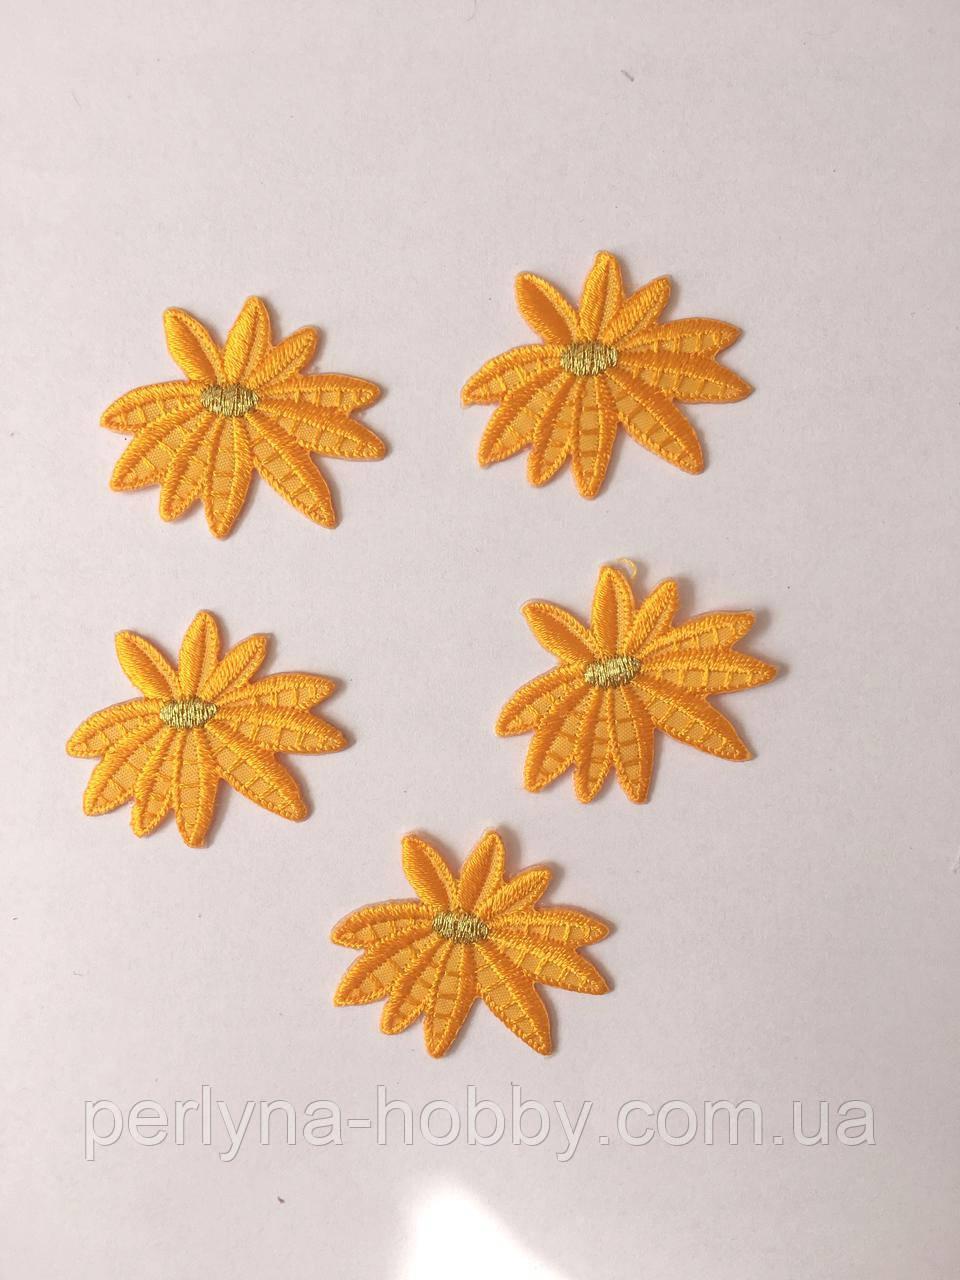 "Аплікації "" Квіти малі 5 штук"" 35 мм, жовто-гарячі (комплект 5 шт)"